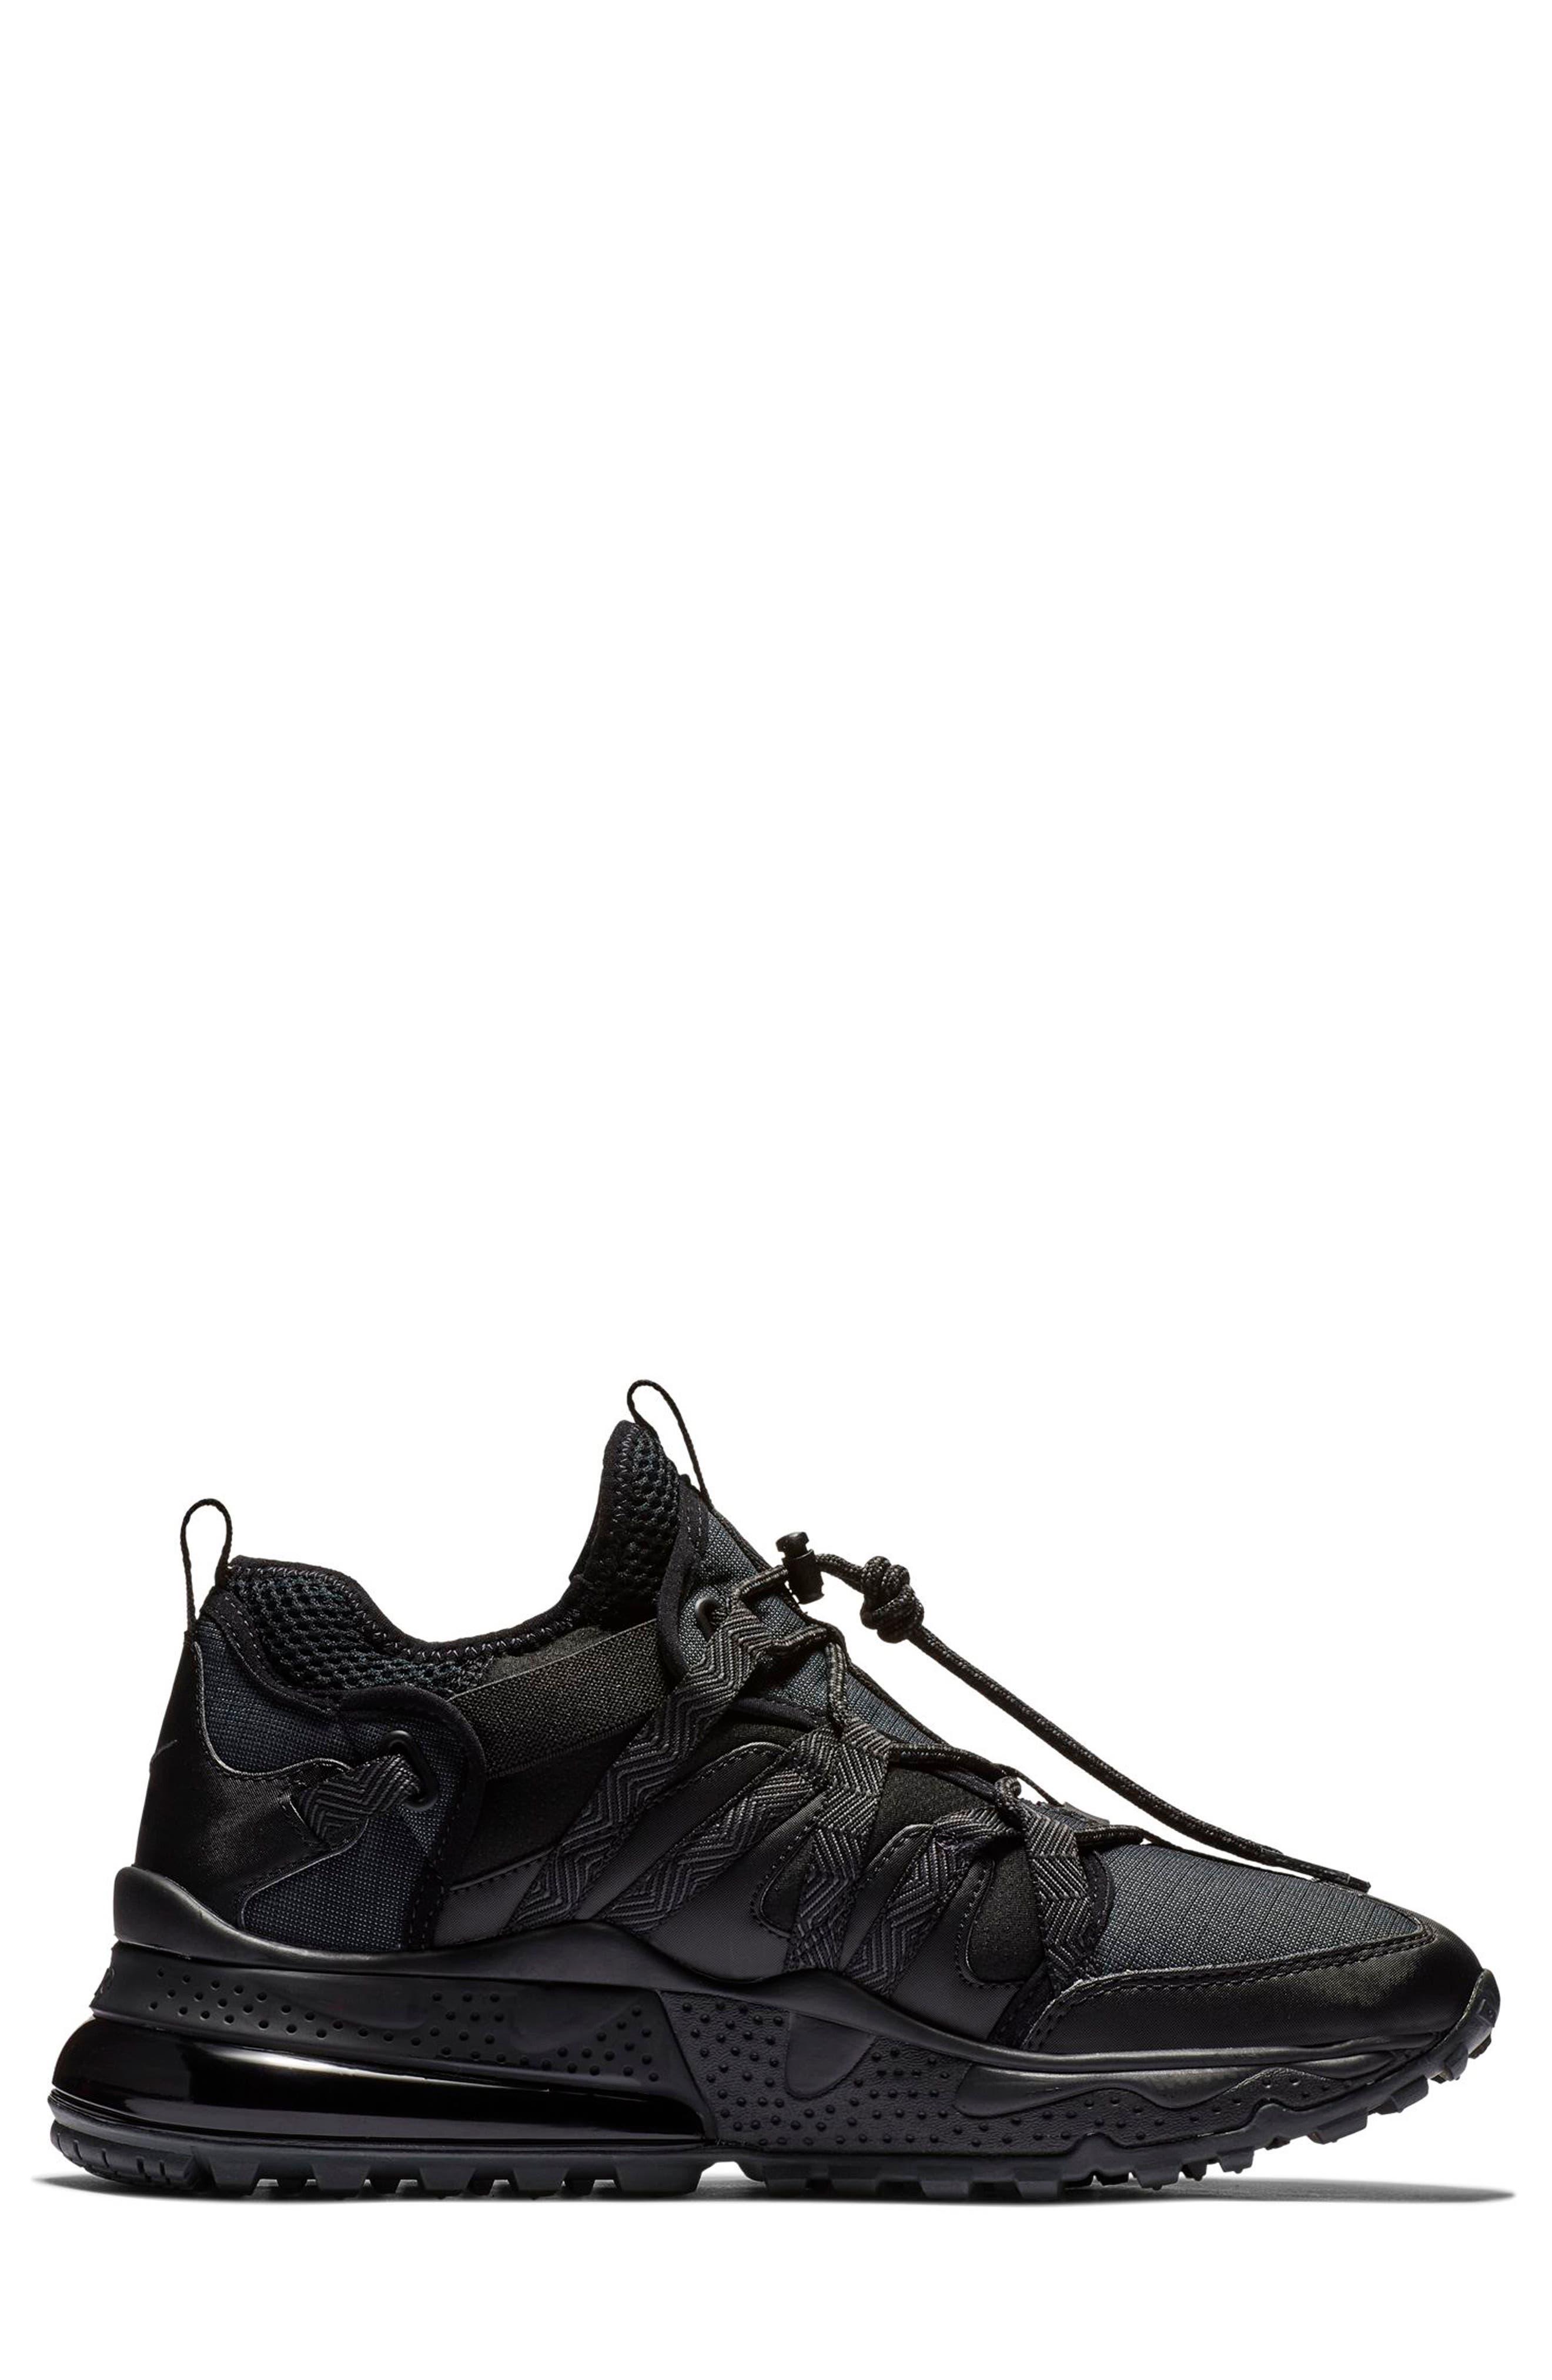 Air Max 270 Bowfin Sneaker,                             Alternate thumbnail 2, color,                             BLACK/ ANTHRACITE/ BLACK